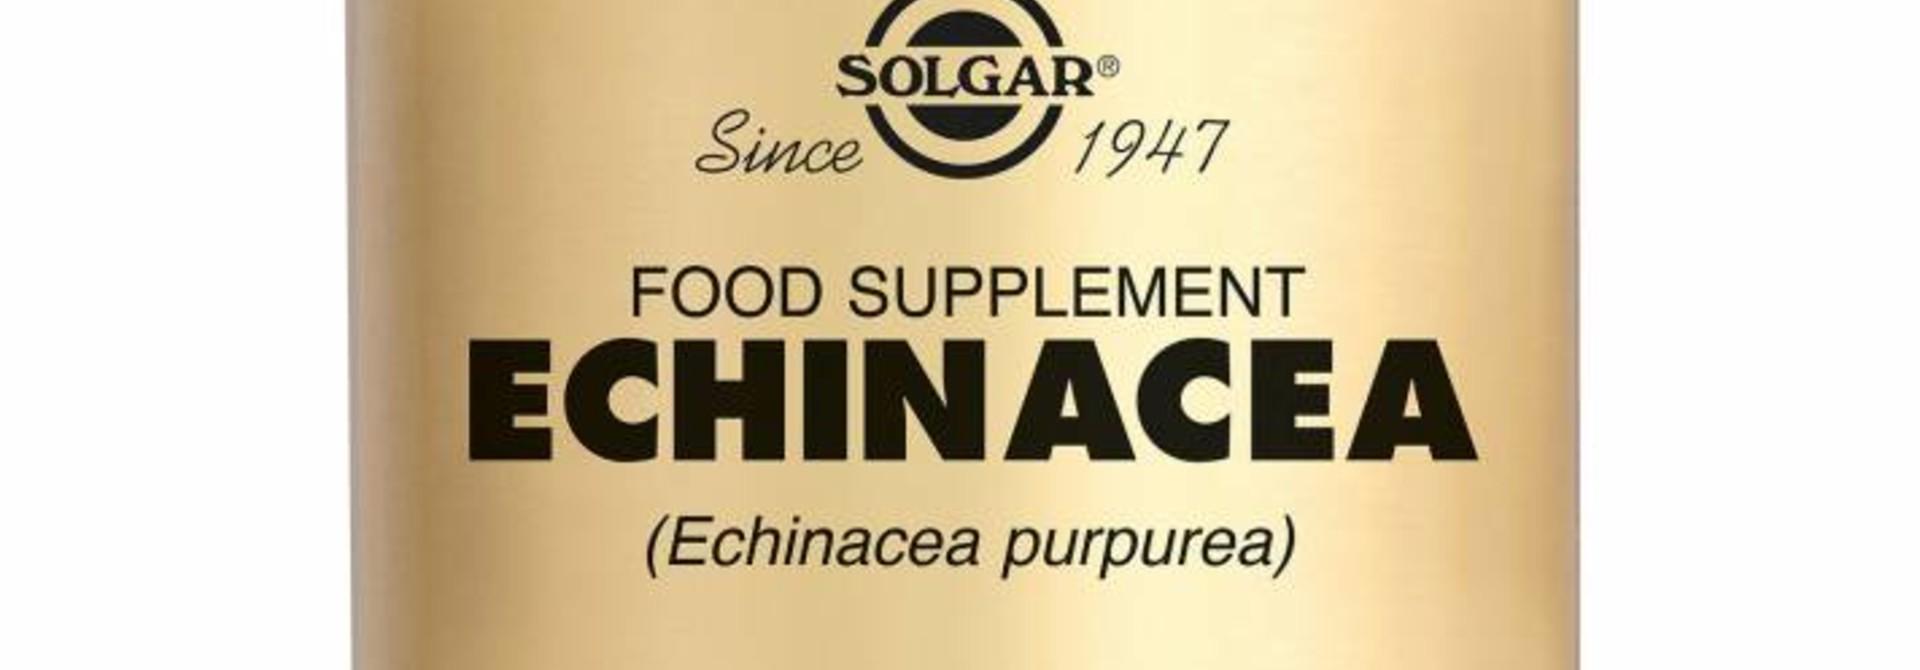 Echinacea 100 plantaardige capsules